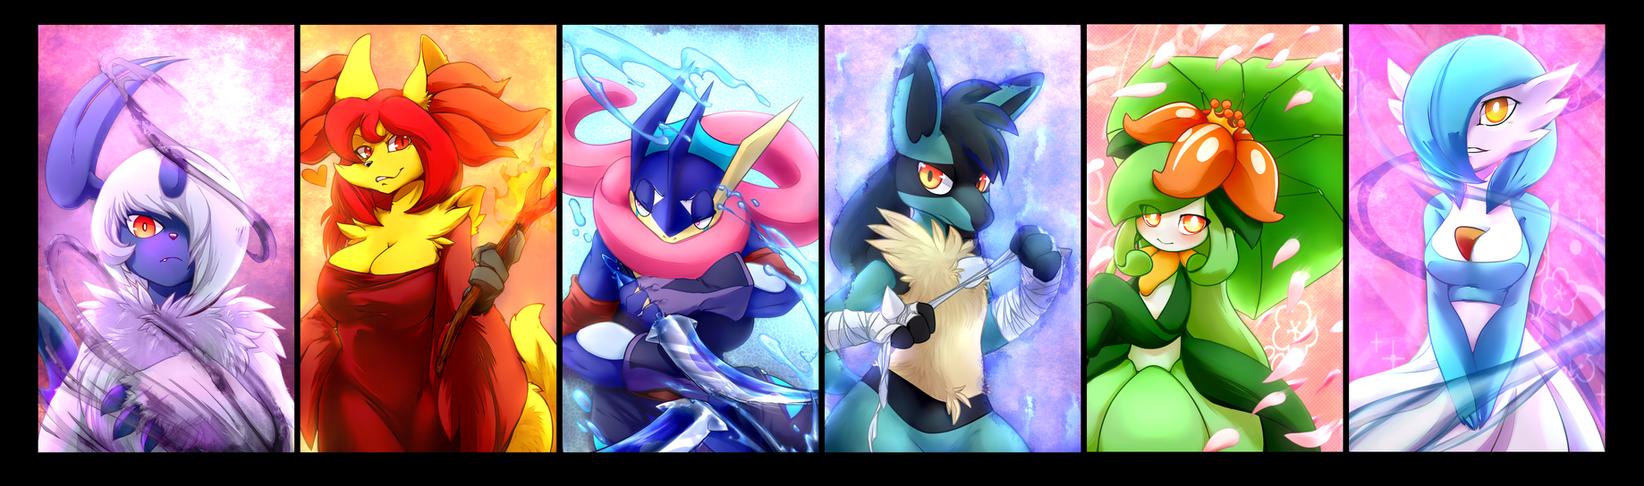 Aero's Pokemon team by V1ciouzMizzAzn